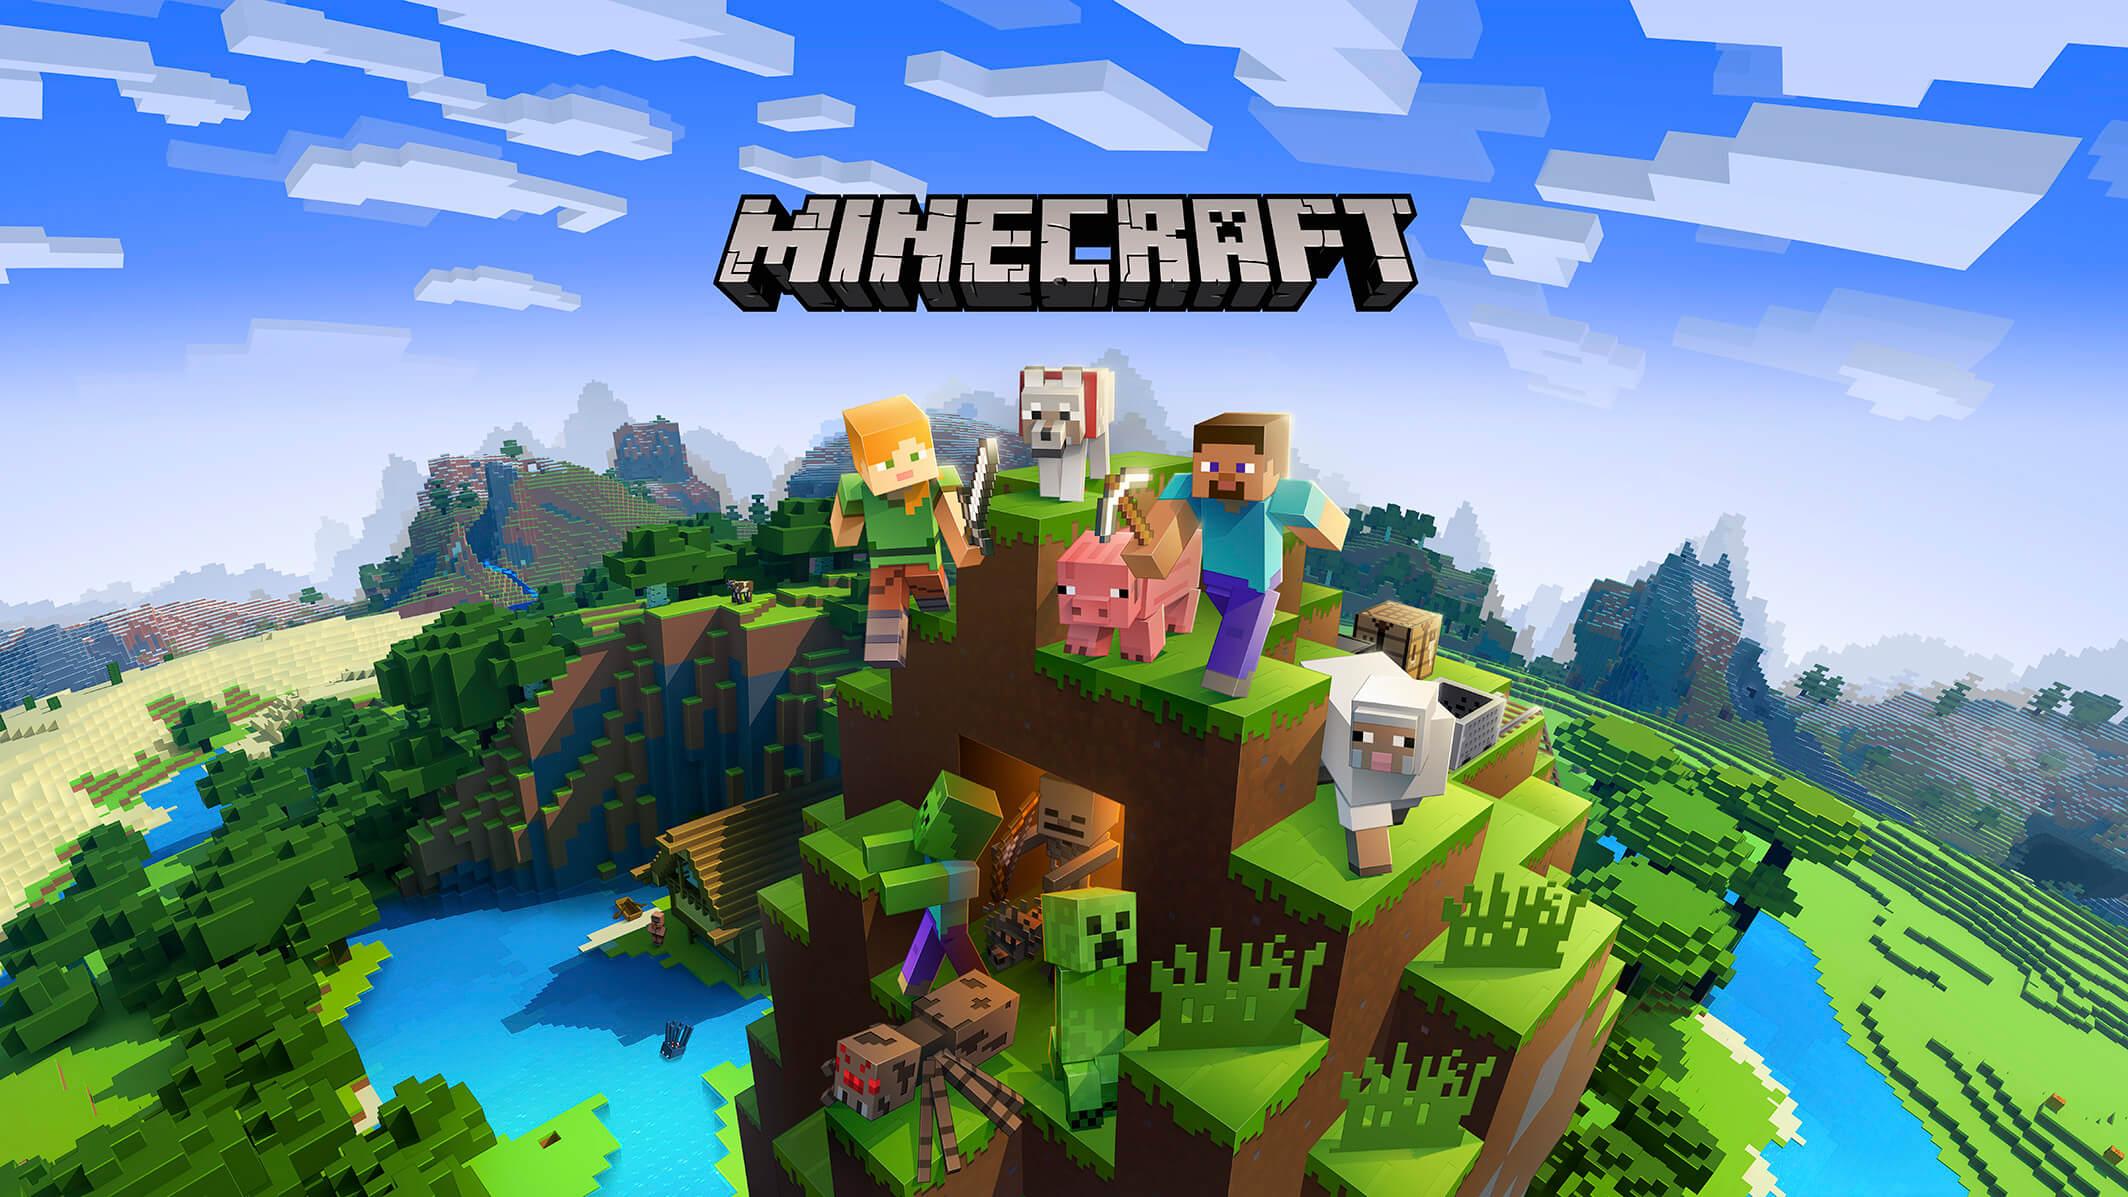 Streamer breaks Minecraft 1.16 speedrun record